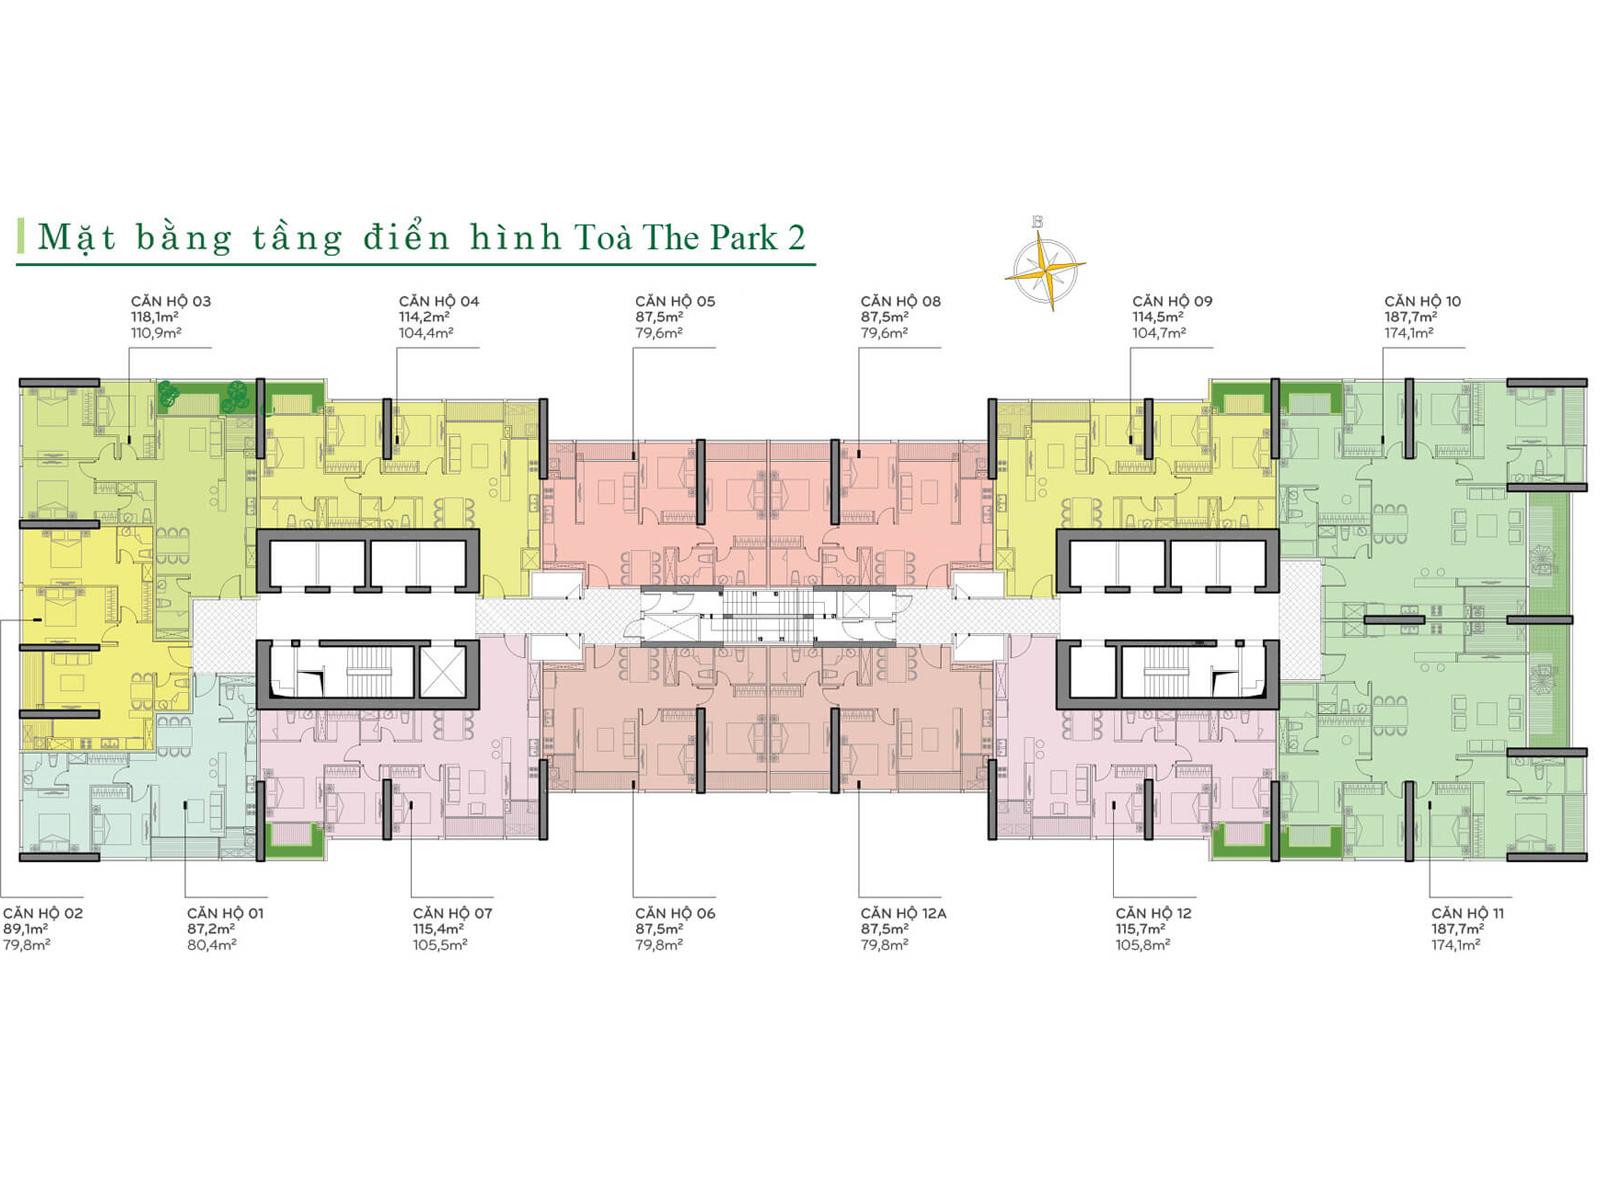 hinh anh Vi sao Vinhomes Central Park la du an duoc quan tam hang dau tai thanh pho Ho Chi Minh  so 7